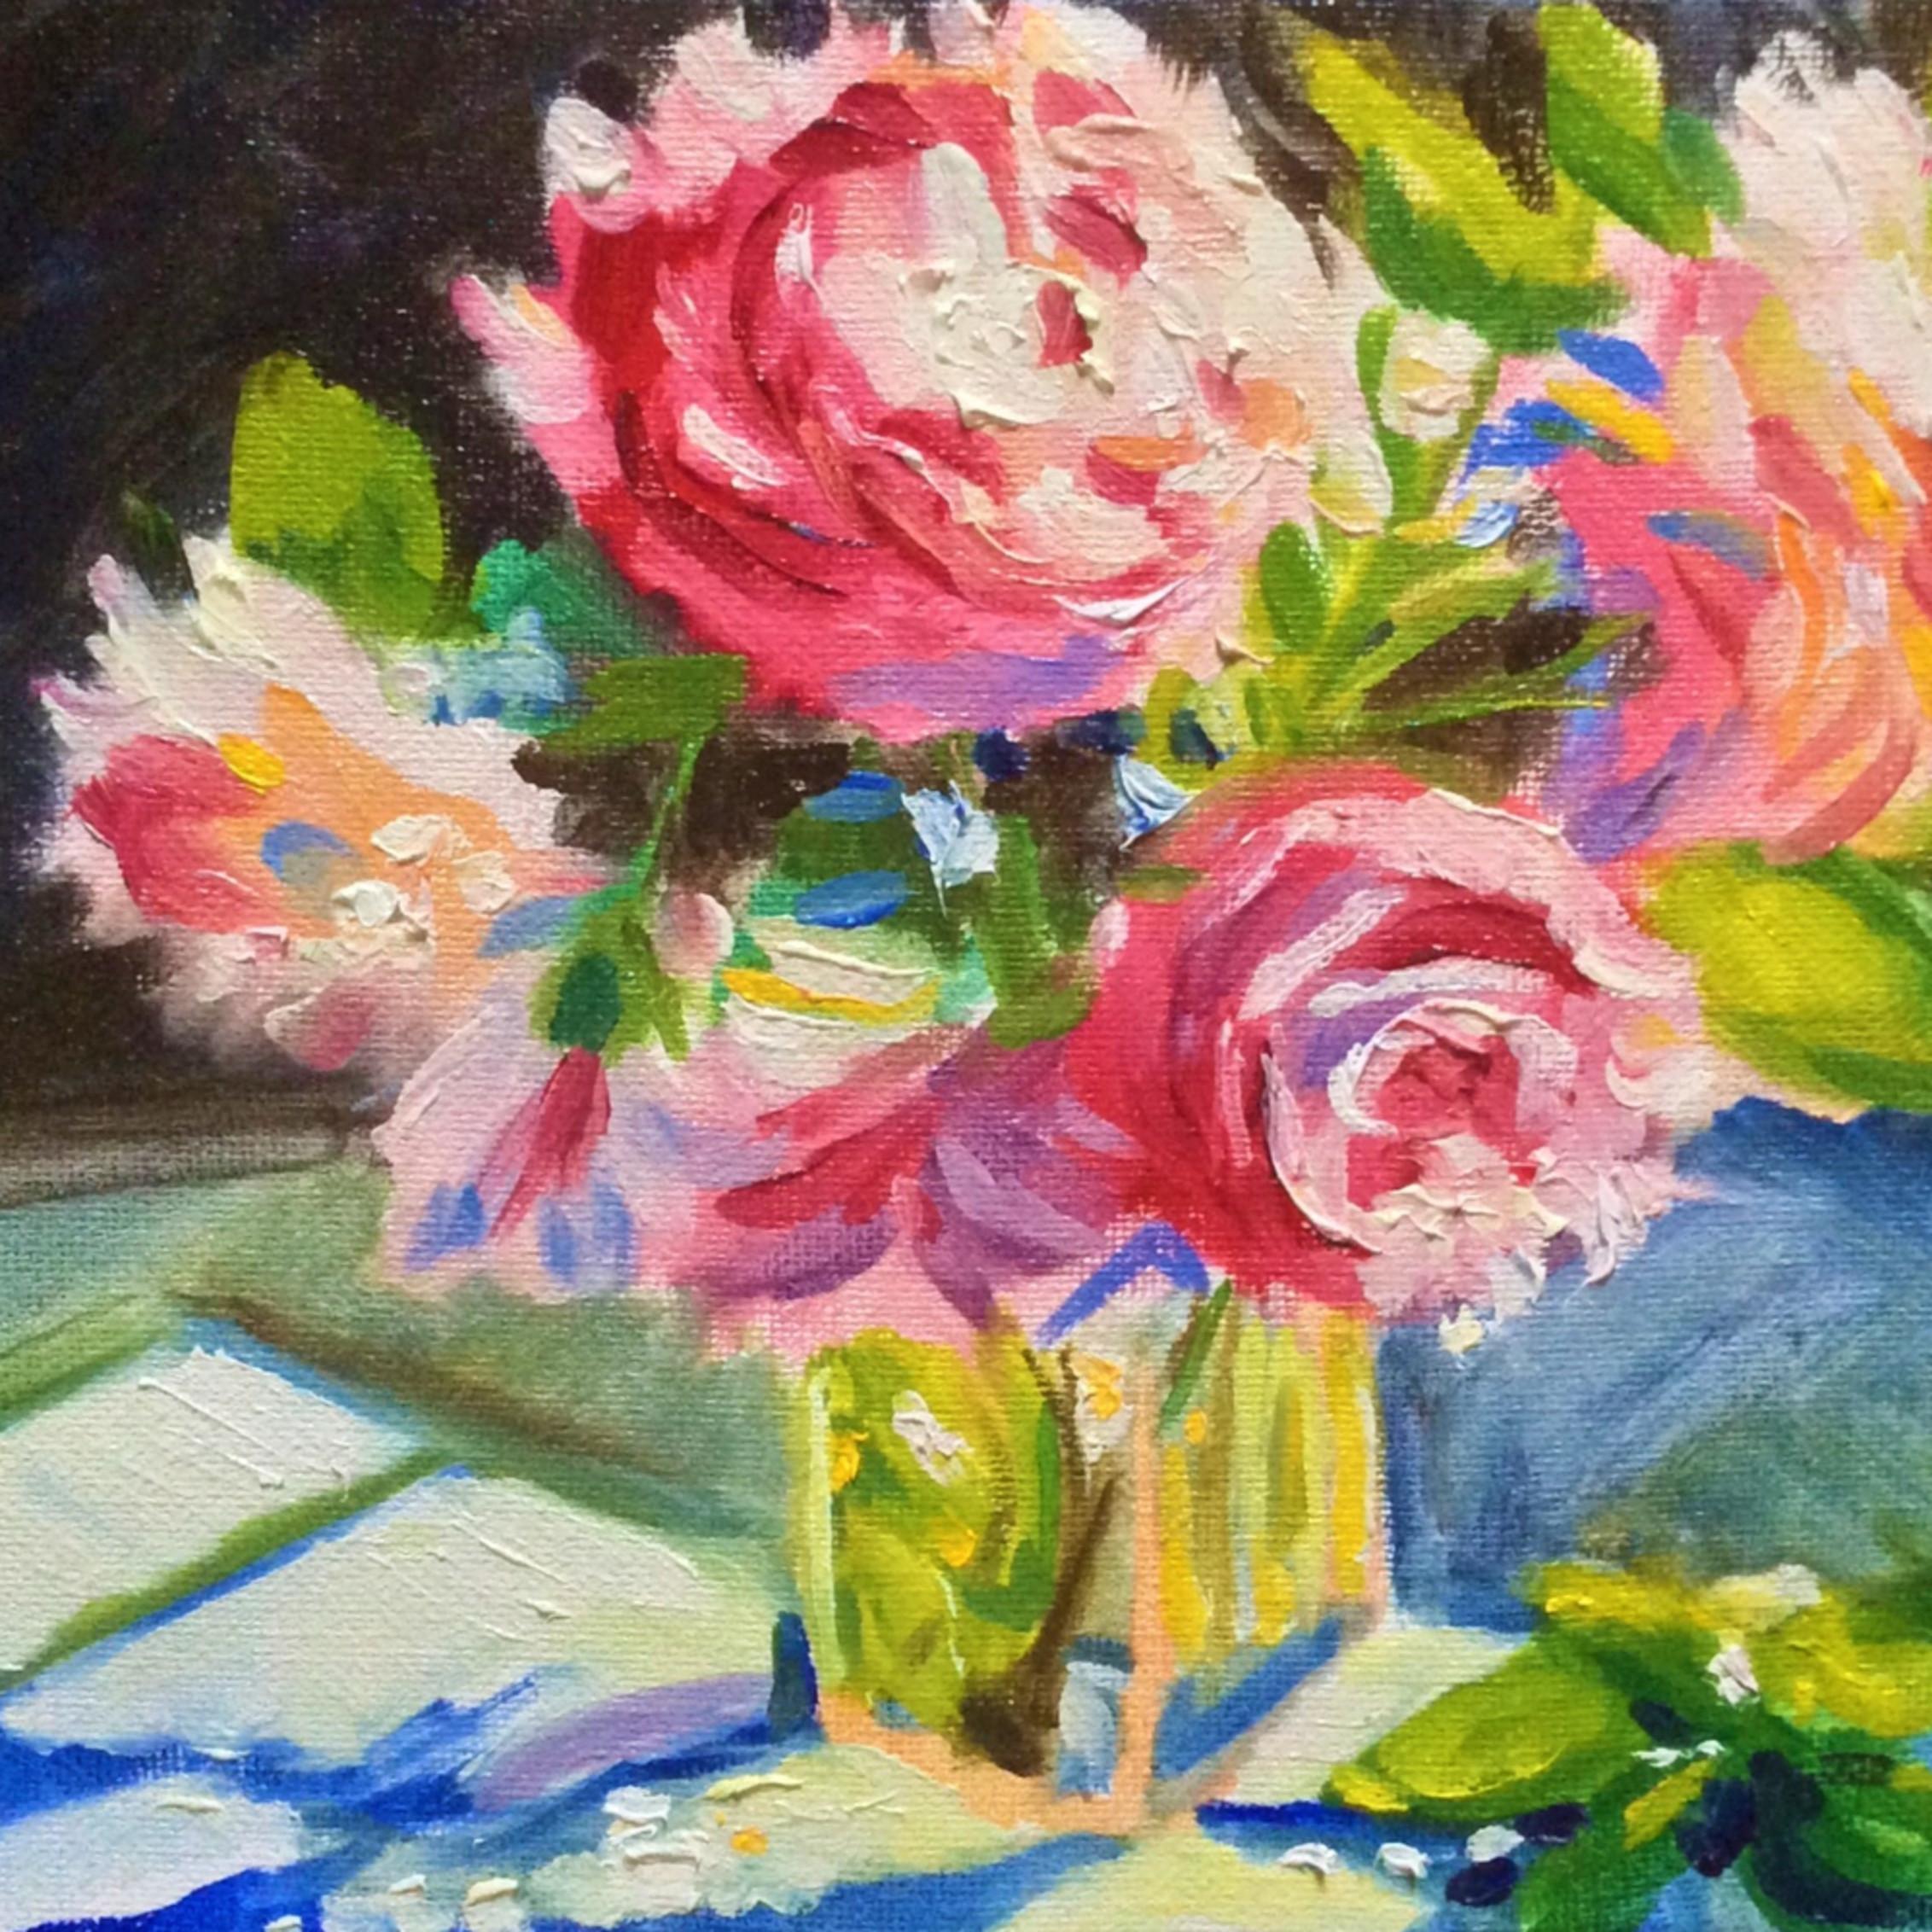 Asf 36 rosesstilllife r0sfh0